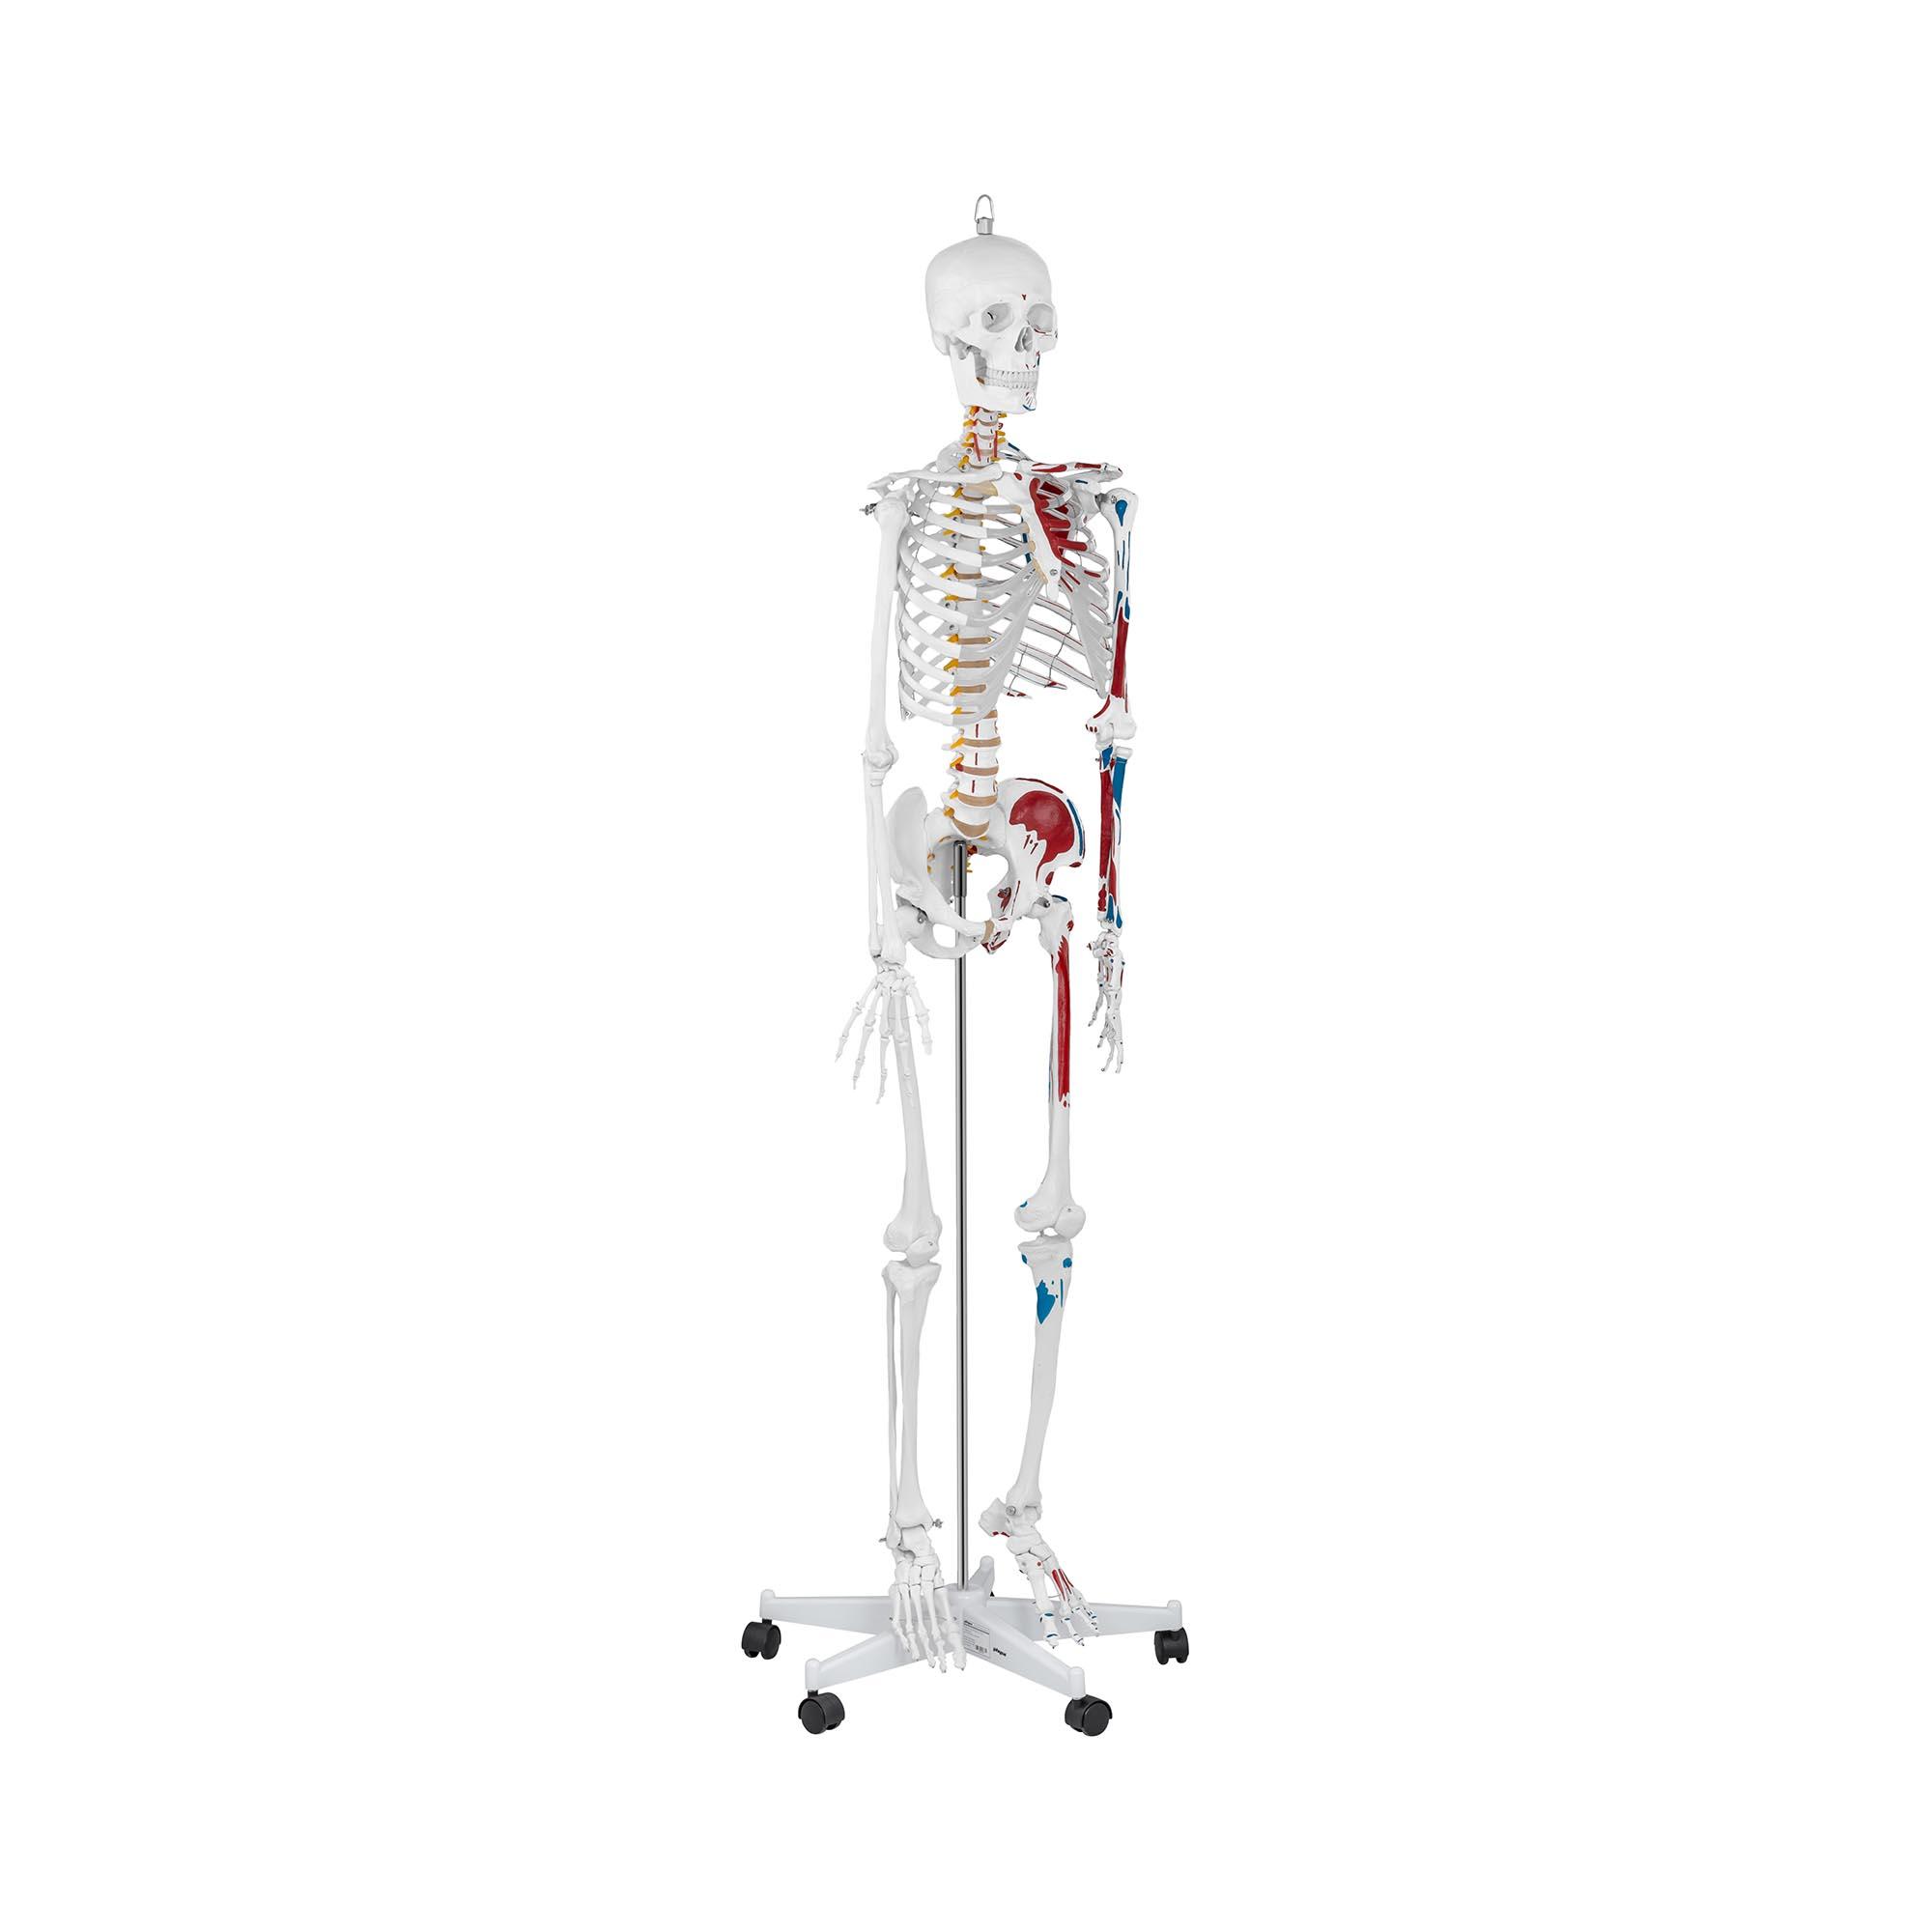 physa Skelett Modell PHY-SK-2 - lebensgroß 10040238